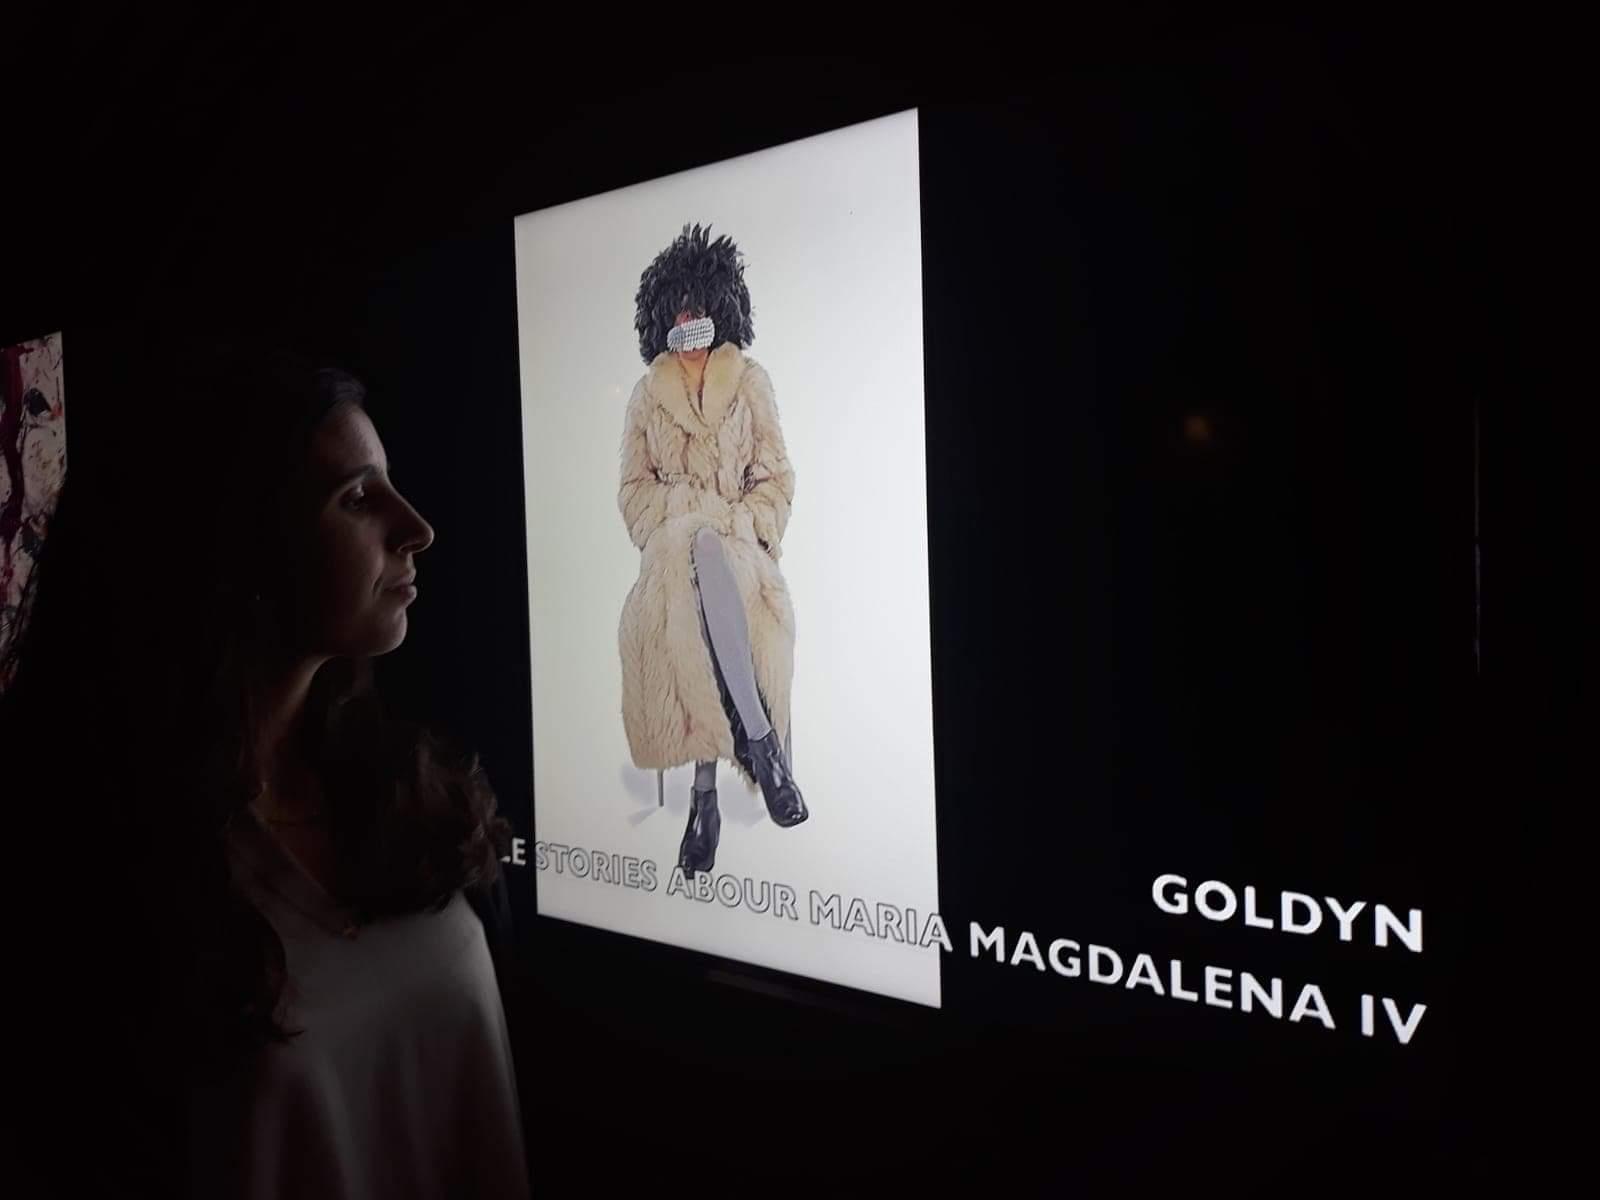 2019 - Art Critics Award, M.A.D.S. Gallery Milano